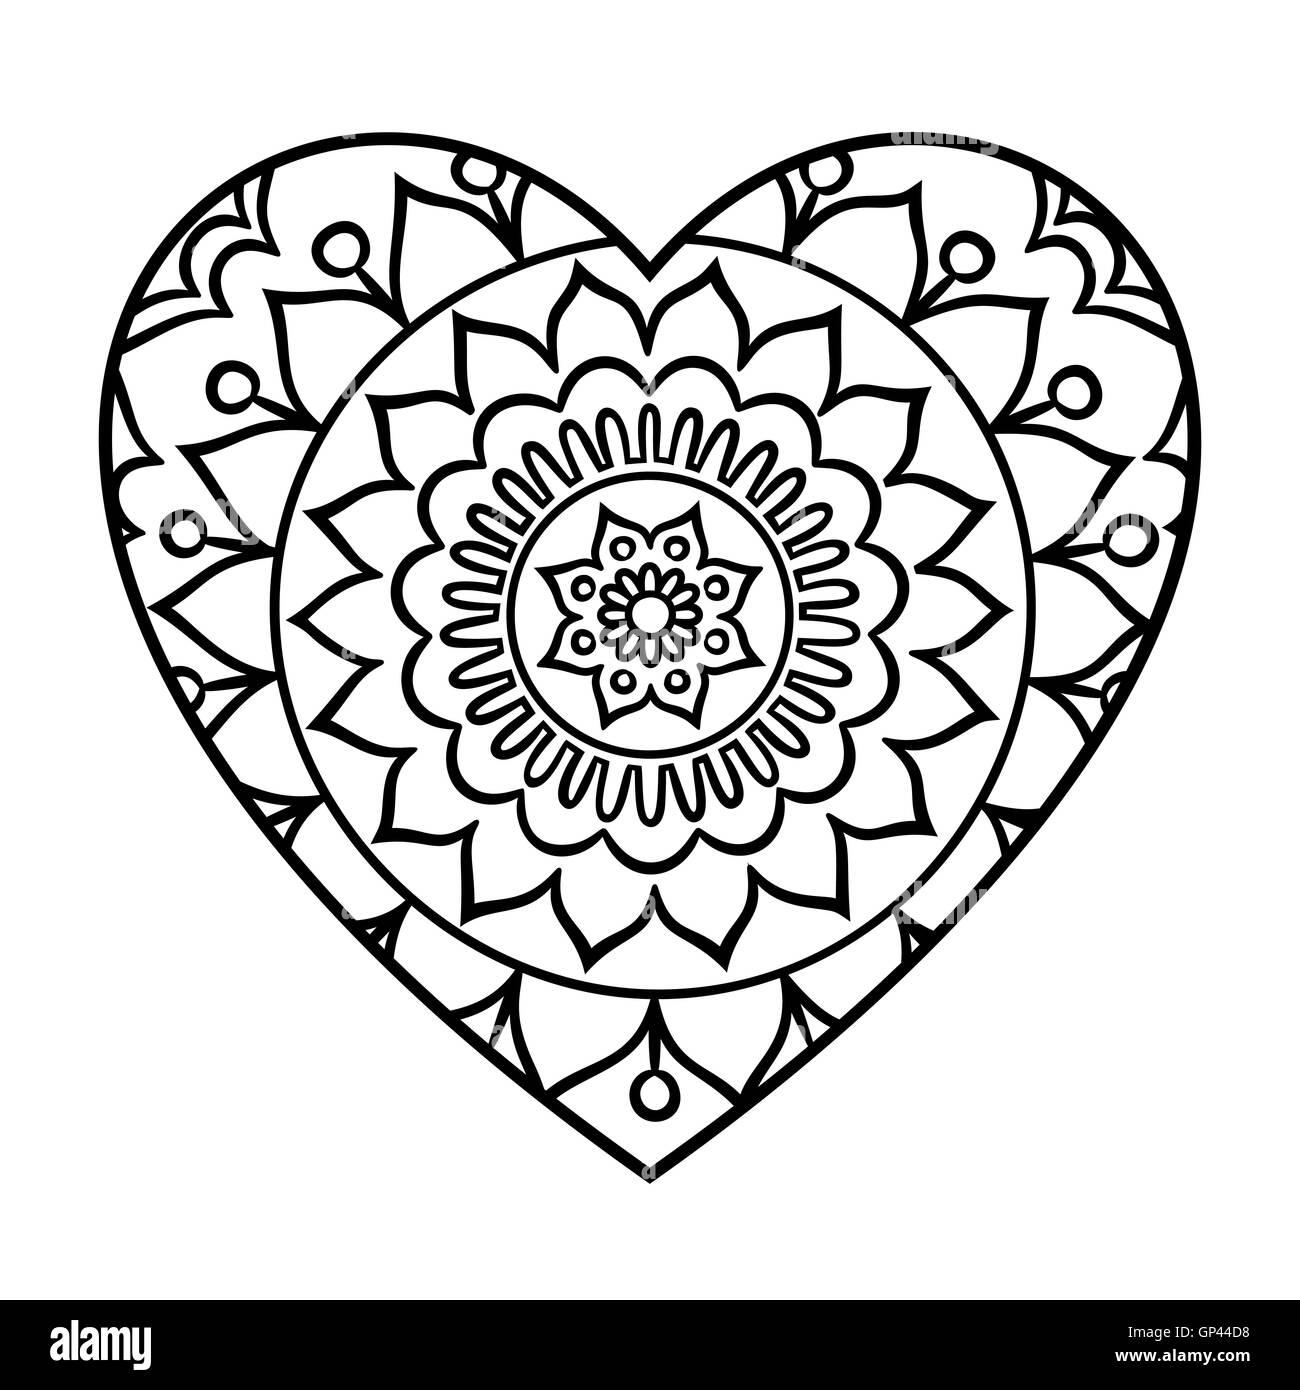 doodle heart mandala stock photos doodle heart mandala stock